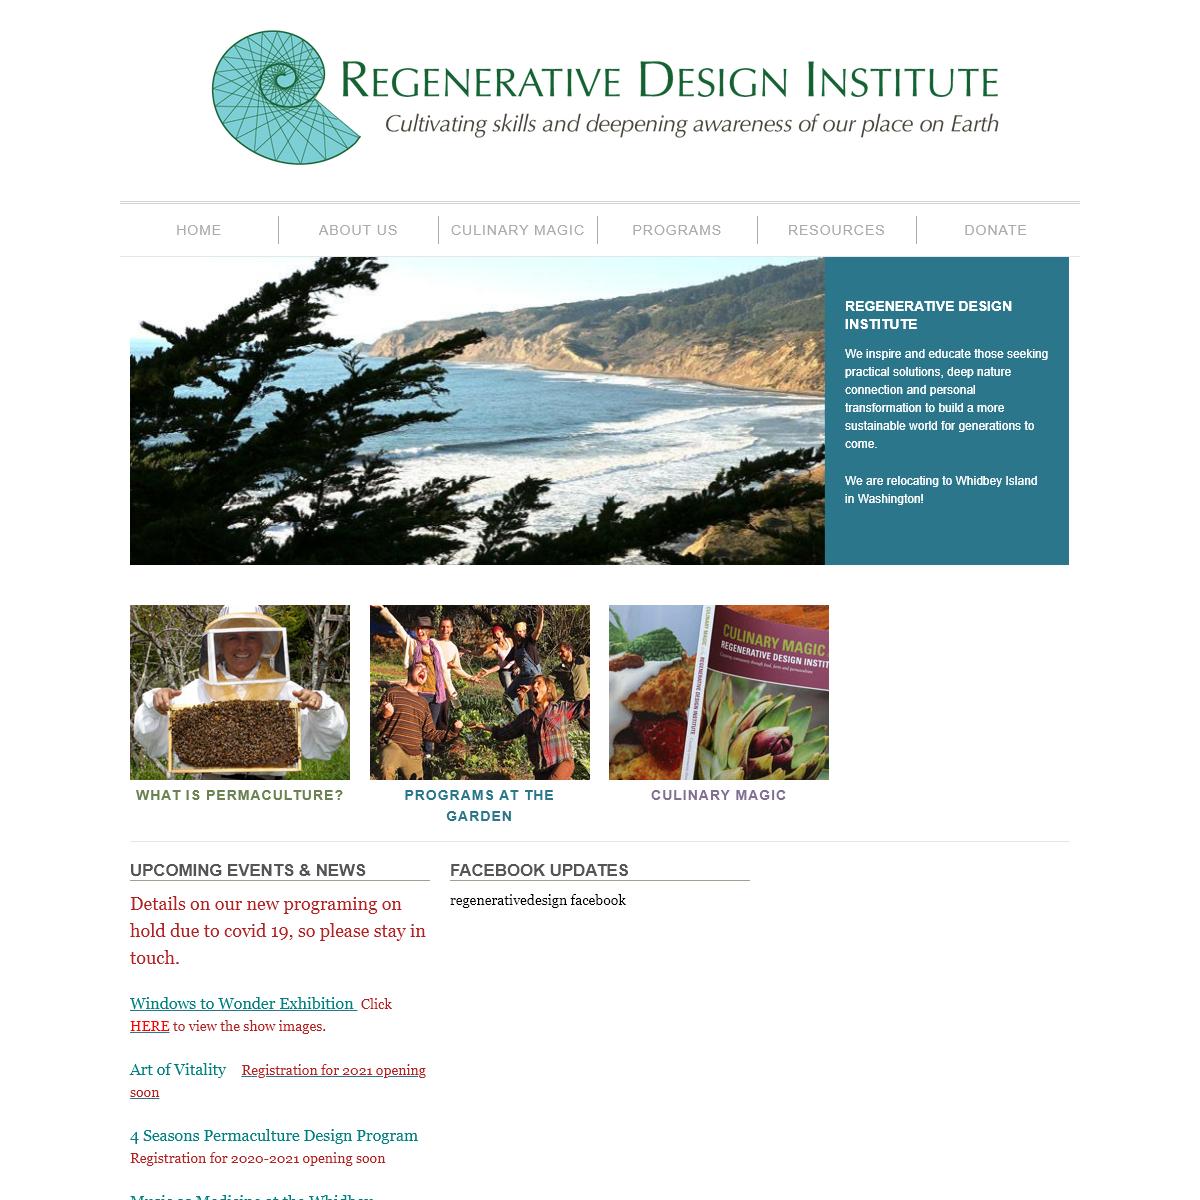 Regenerative Design Institute at Commonweal Garden - Permaculture in Action